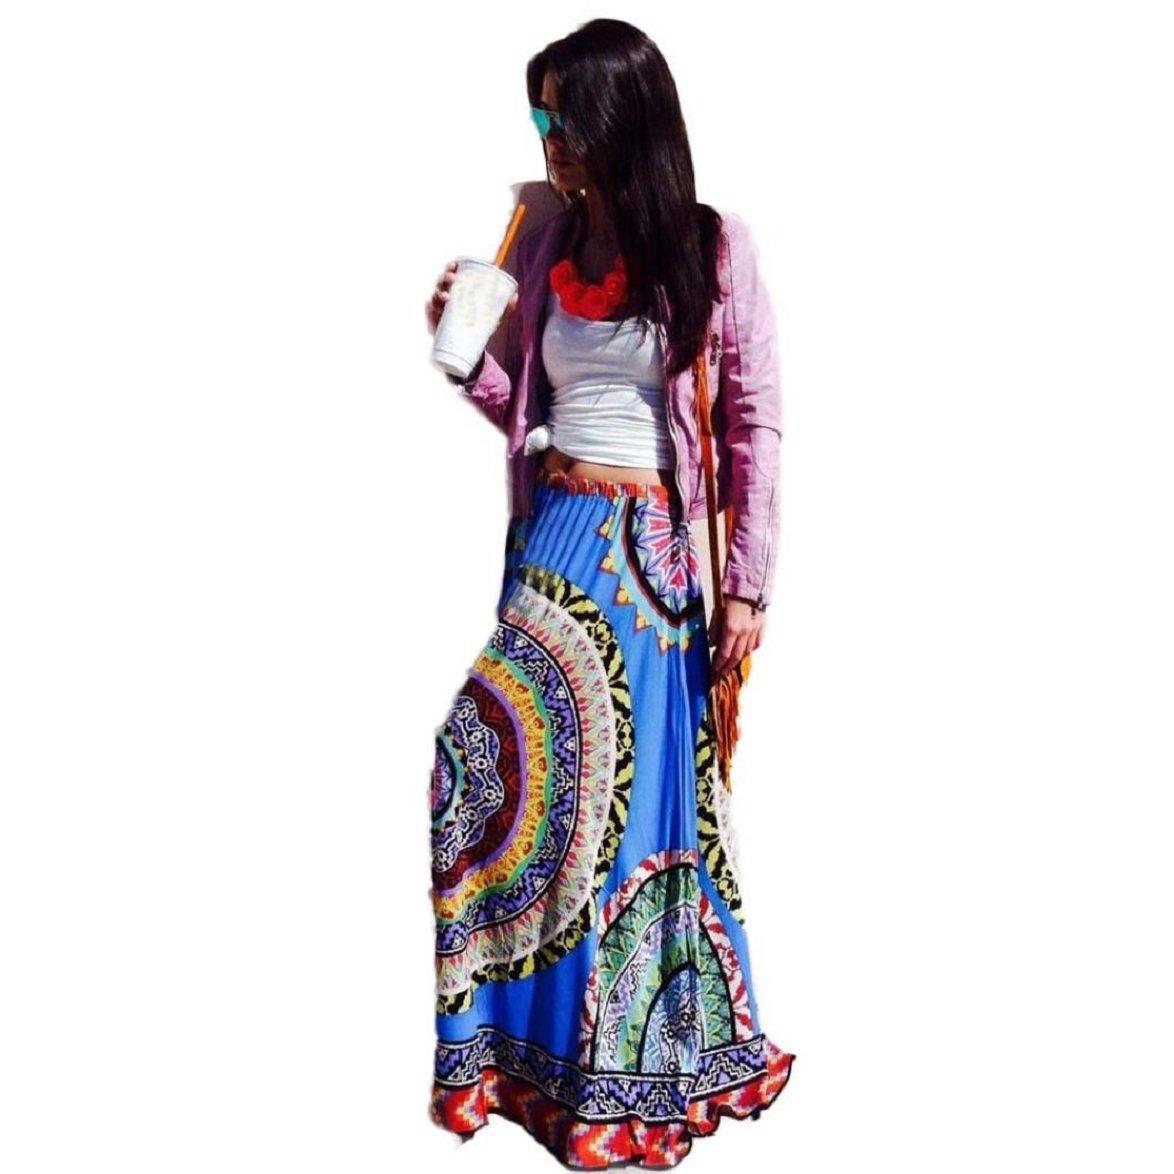 Lookatool Women Summer Casual Traditional African Print Beach Skirt Lookatool®21